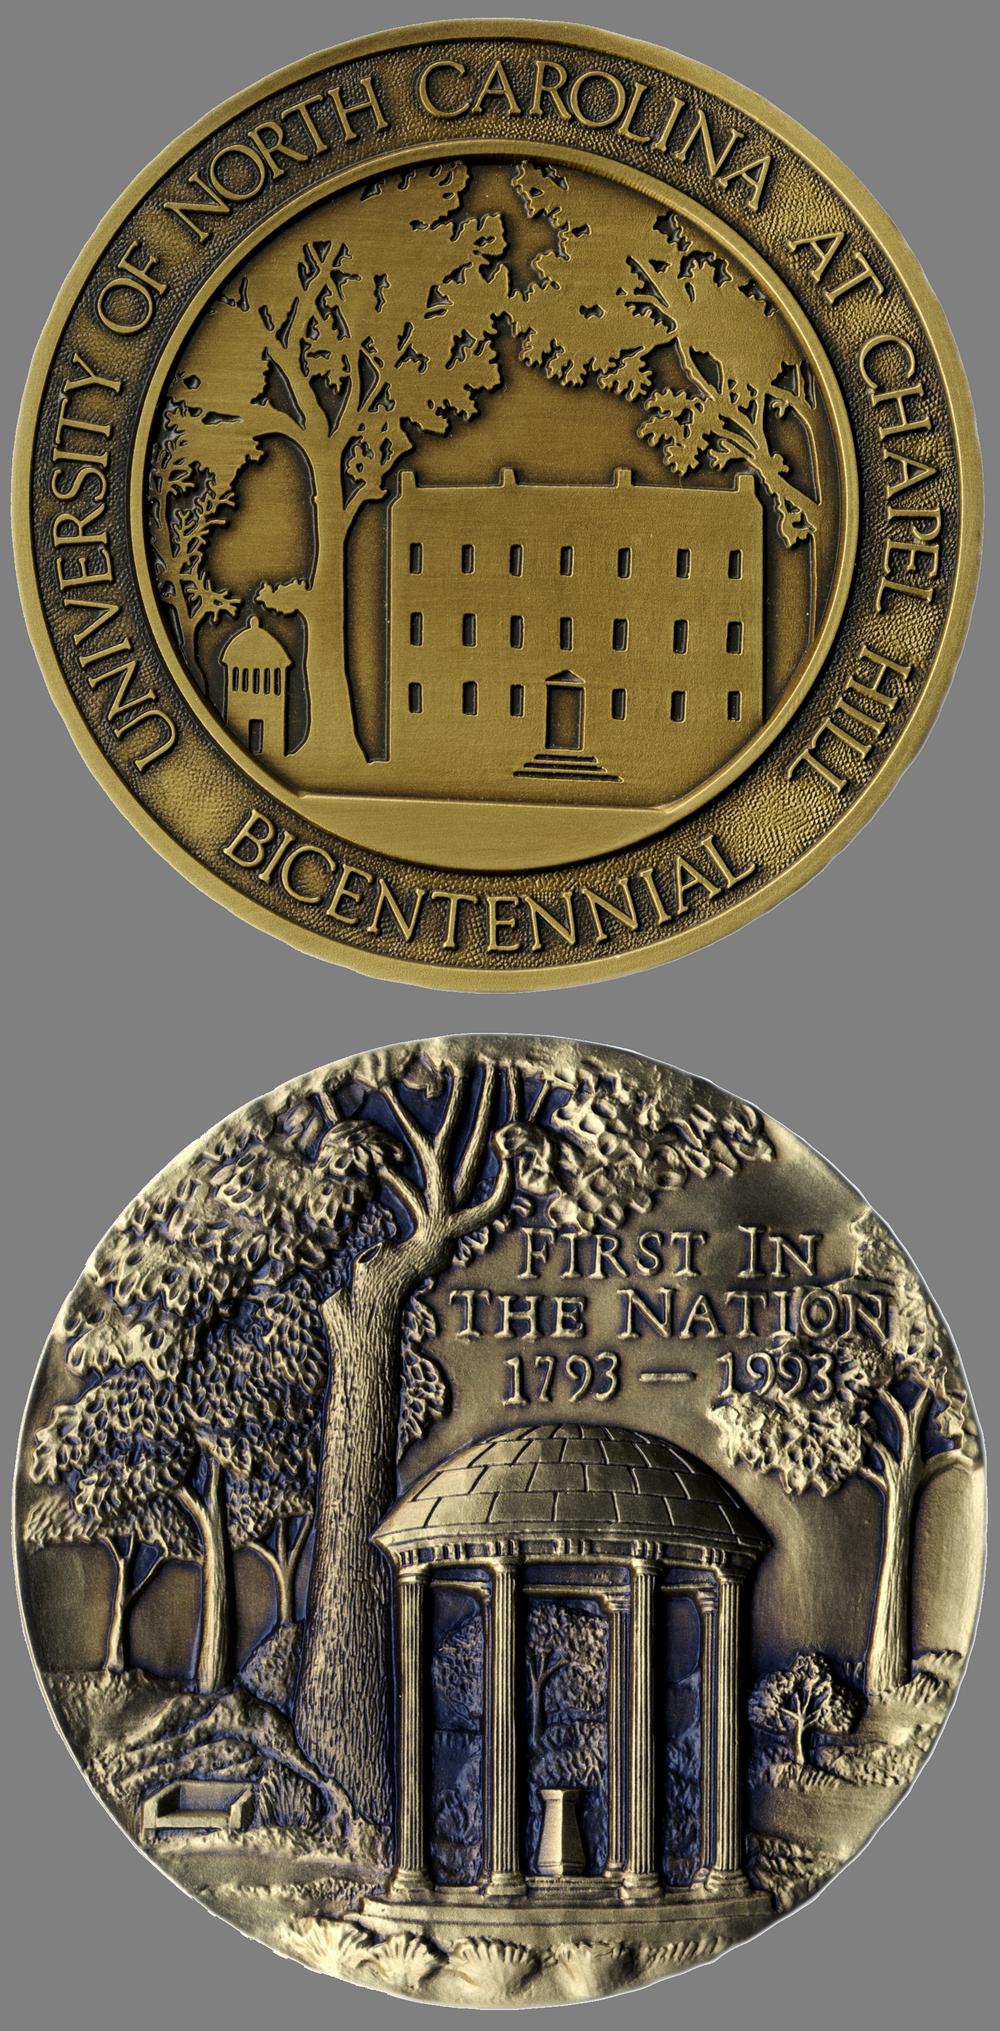 University of North Carolina Bicentennial medal, 1993